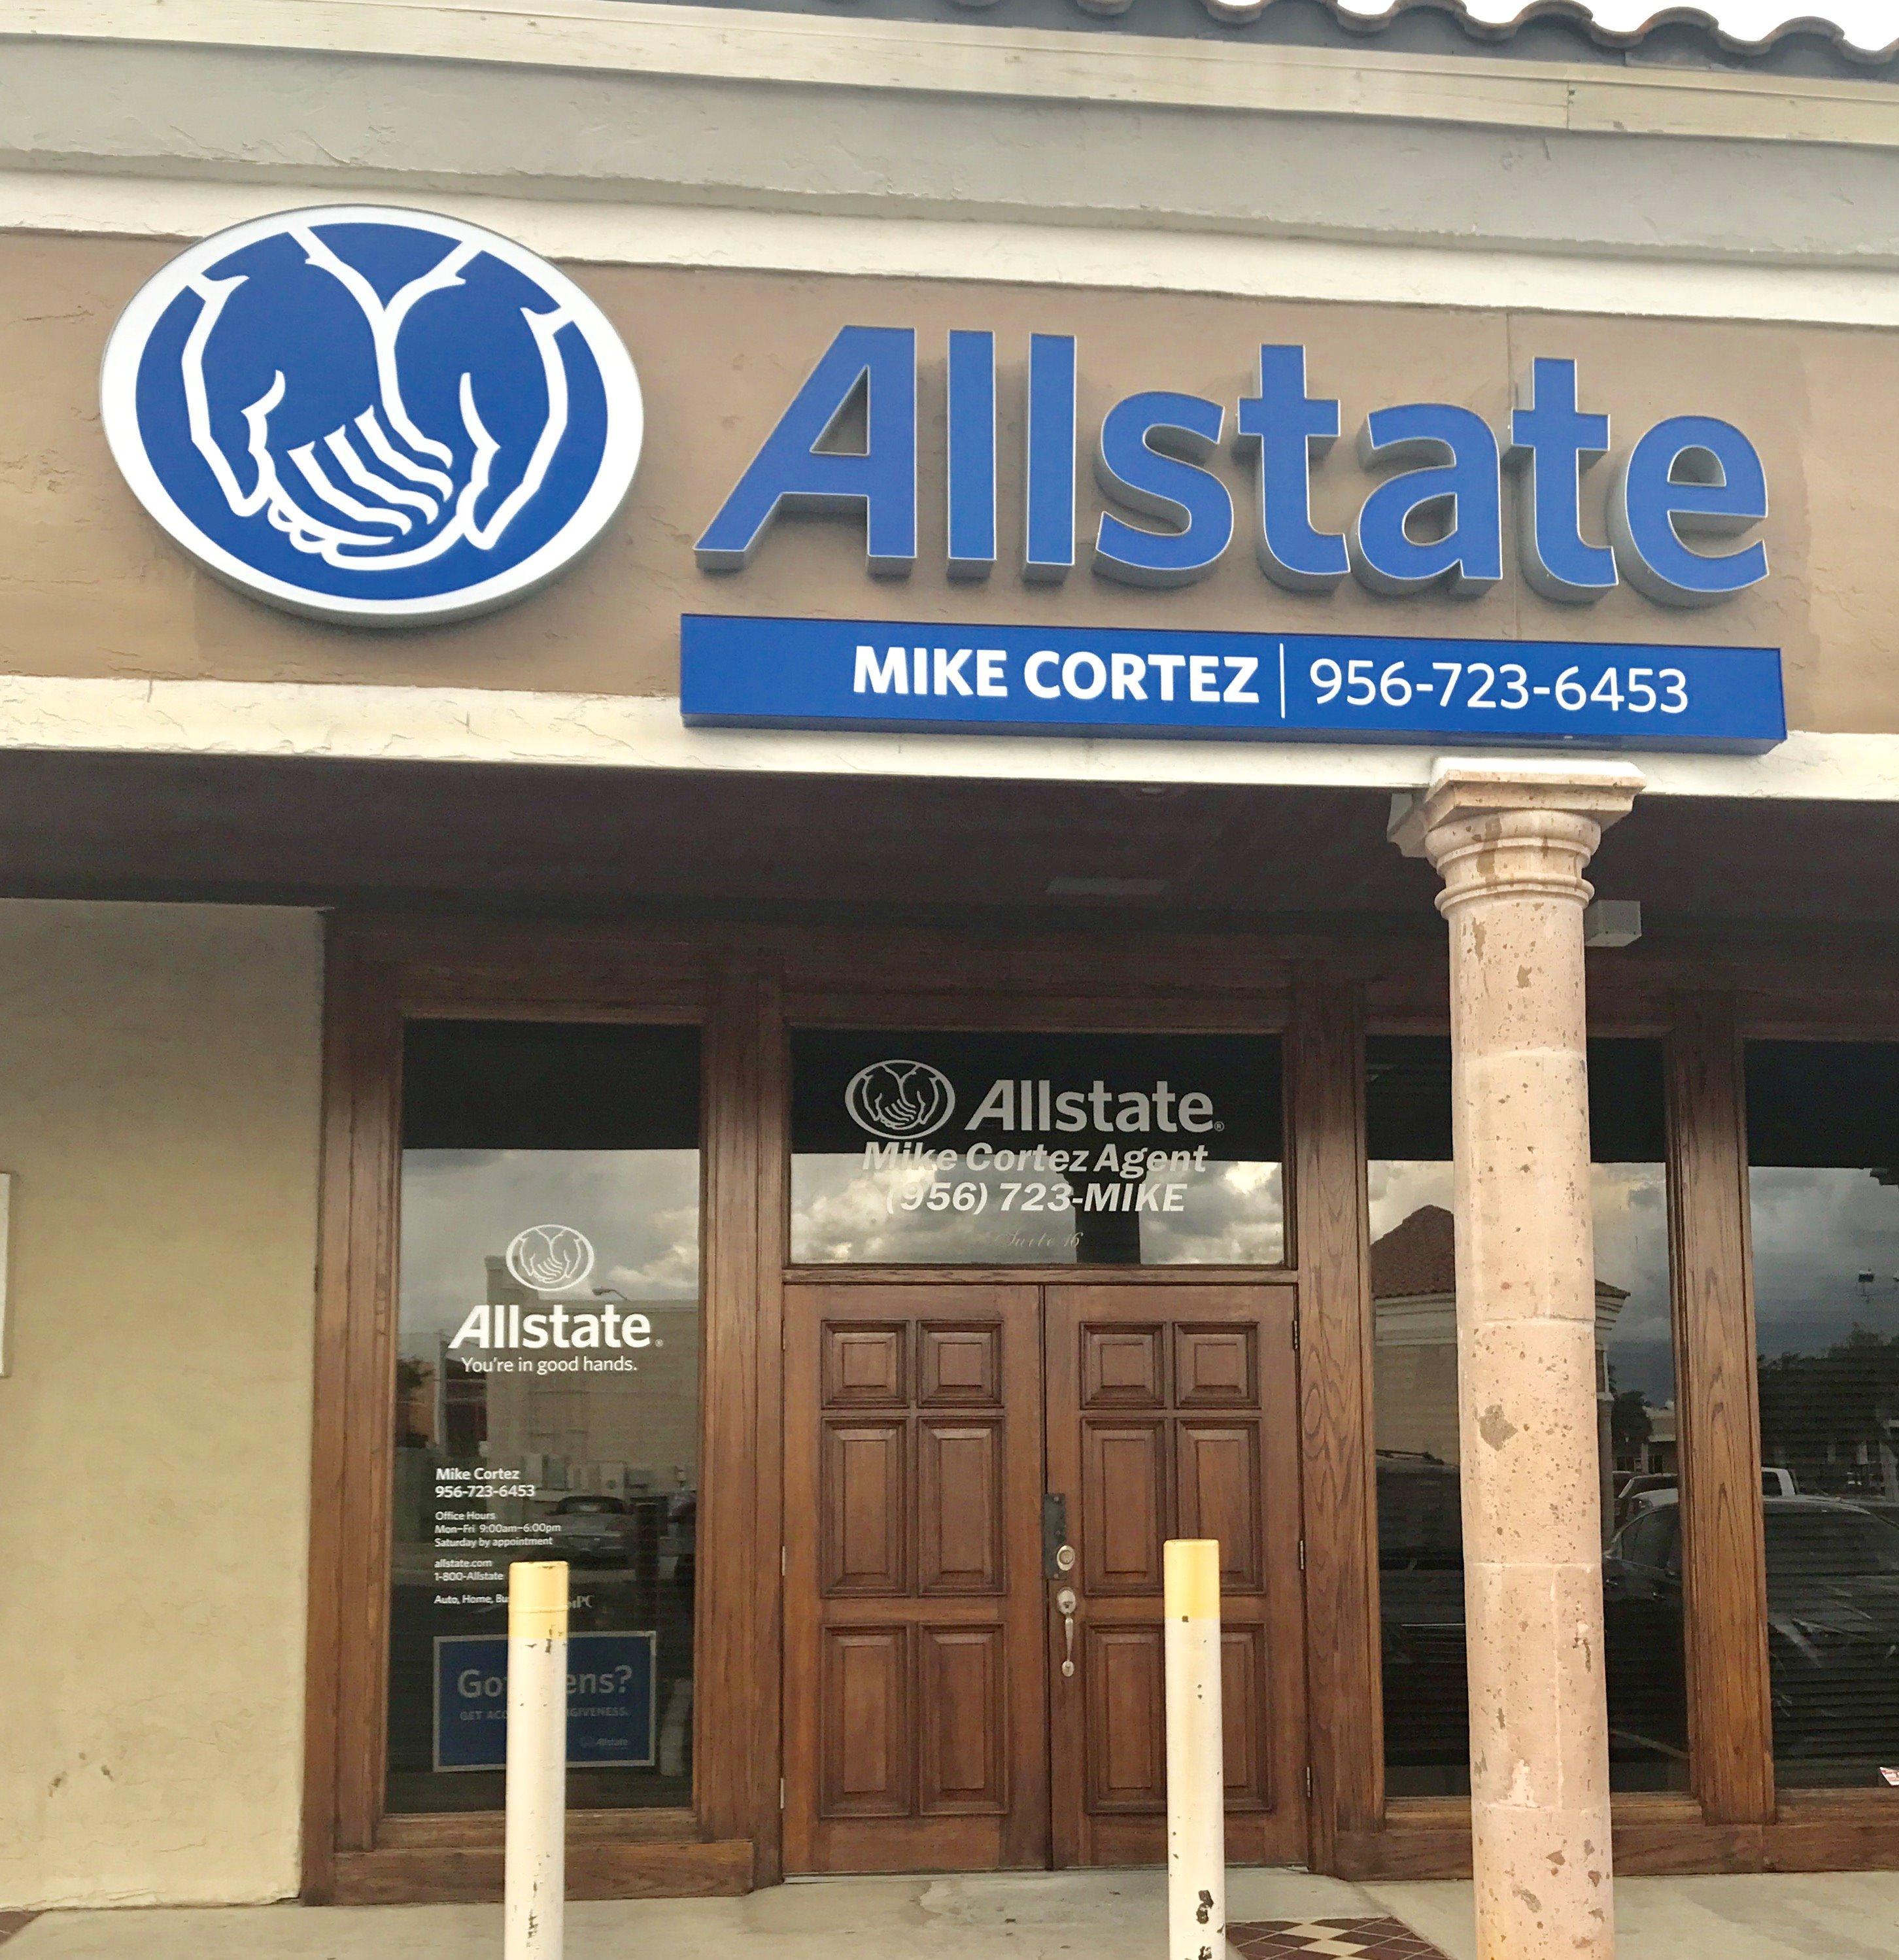 Mike Cortez: Allstate Insurance image 1